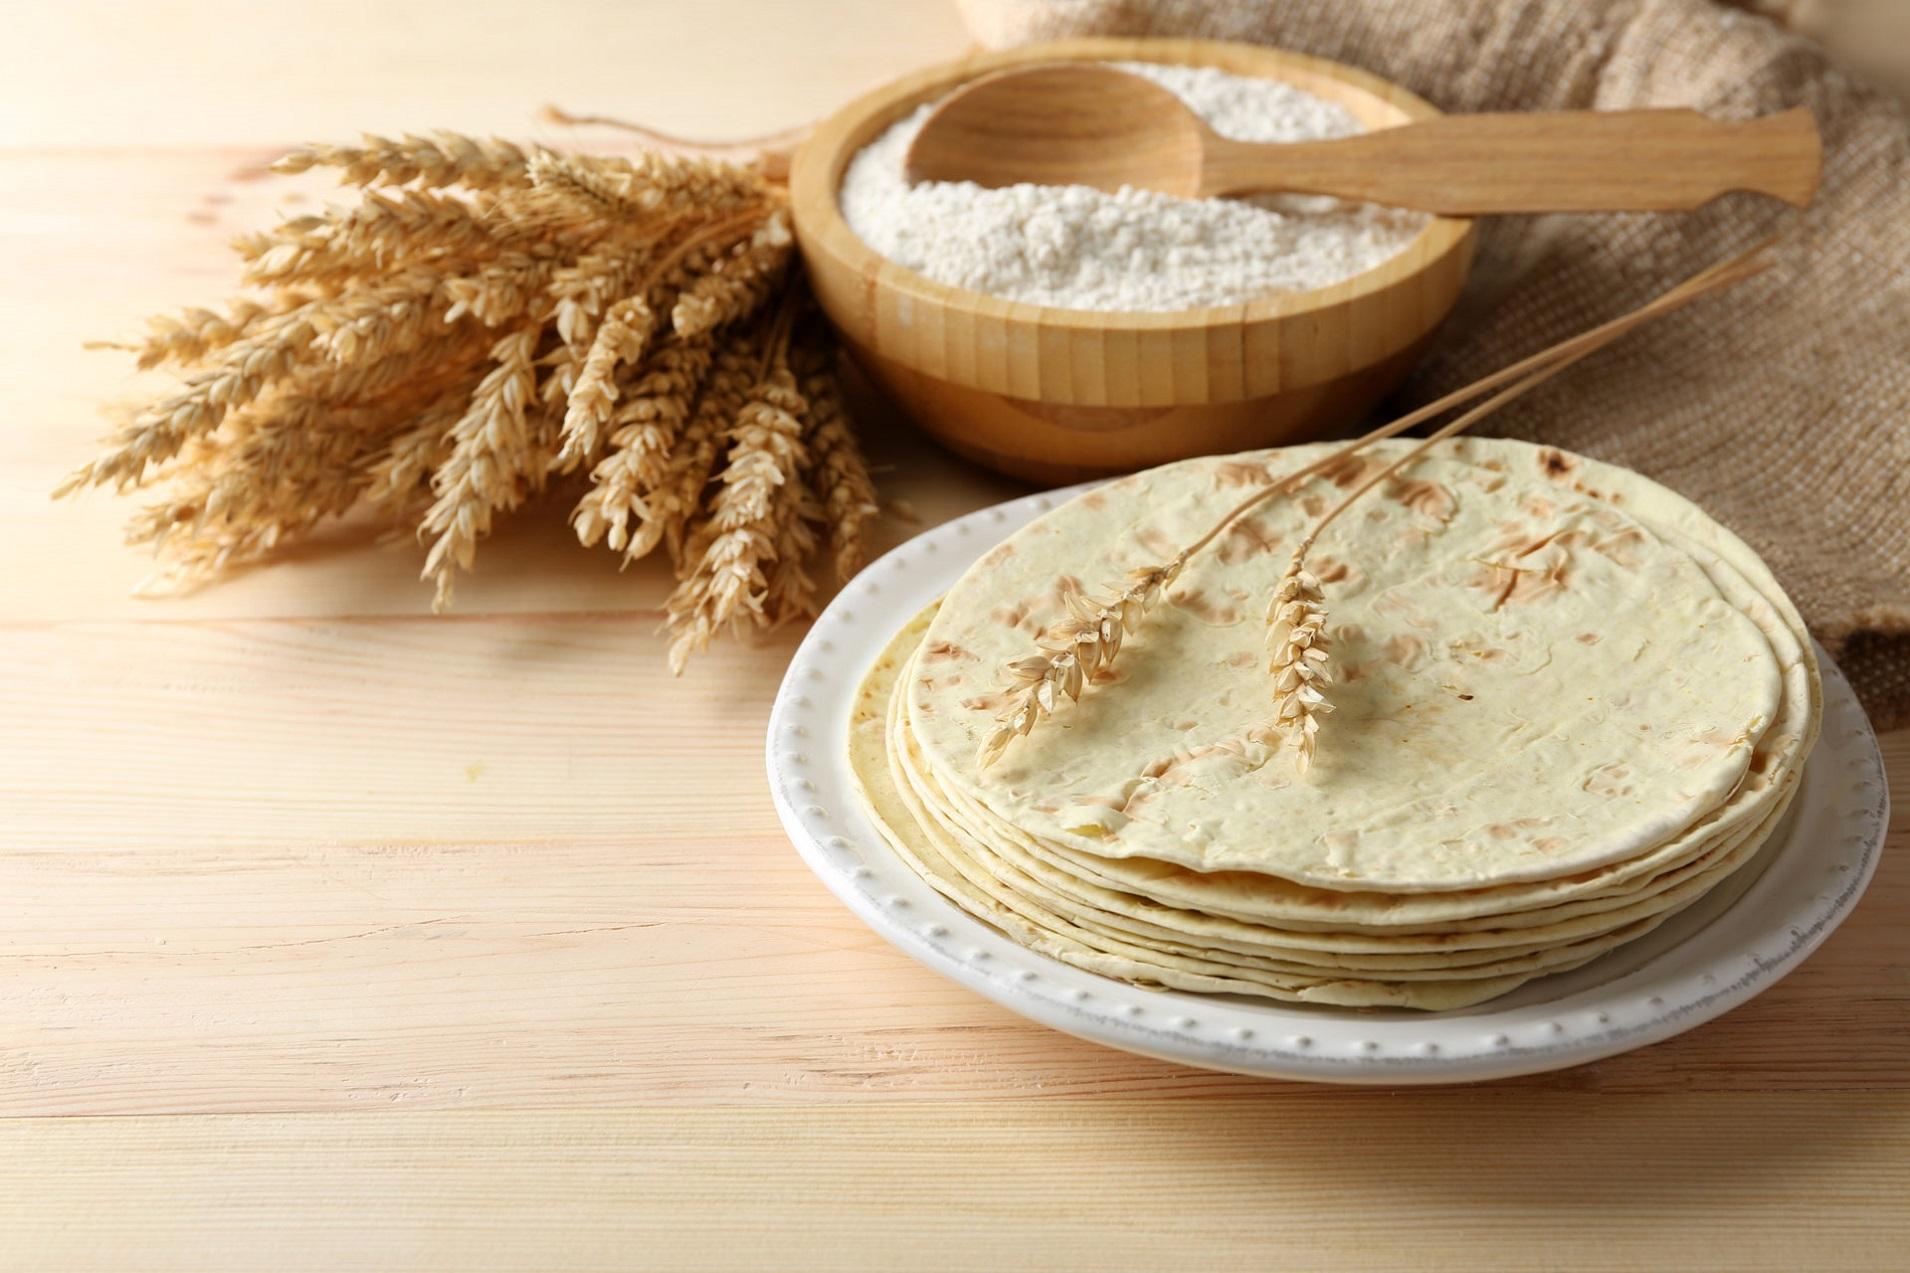 Harinera Guadalupe, Tortillas de Harina